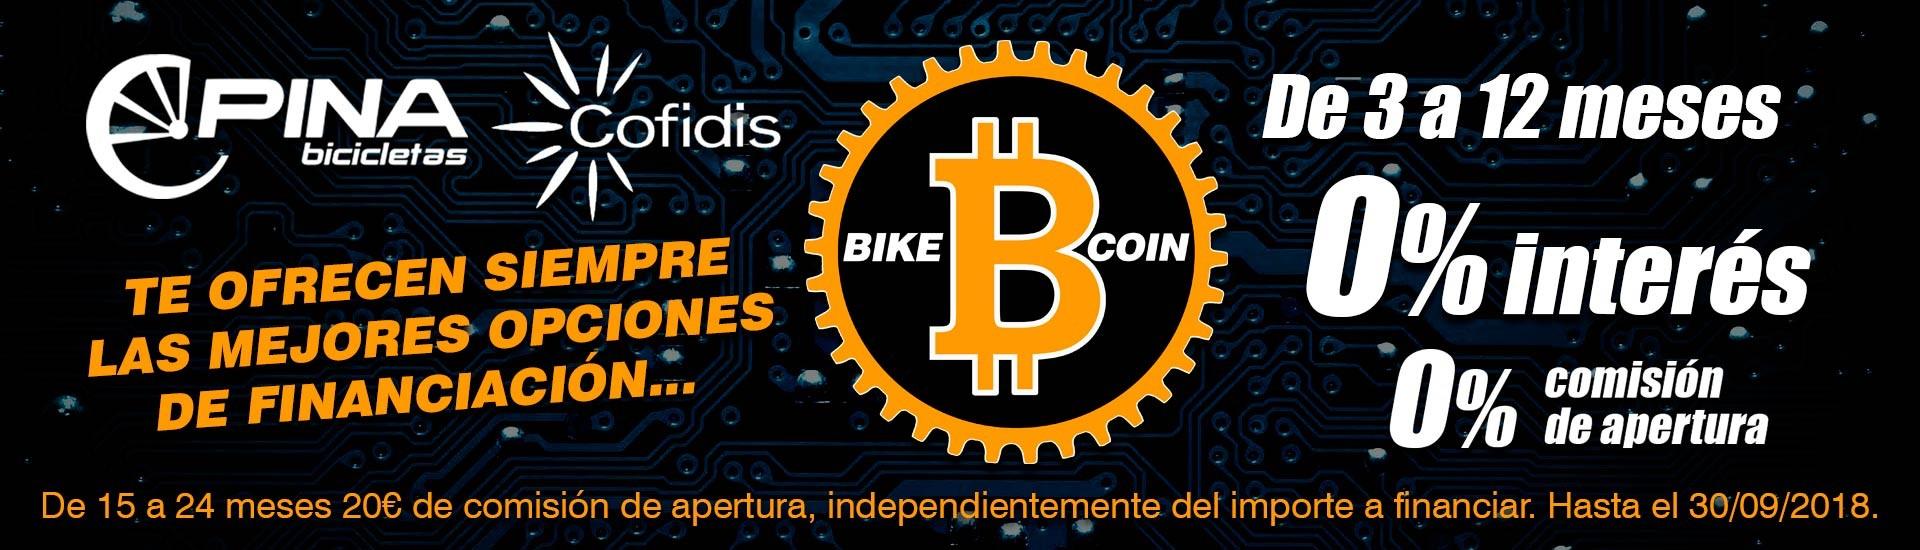 Financiación Cofidis verano 2018